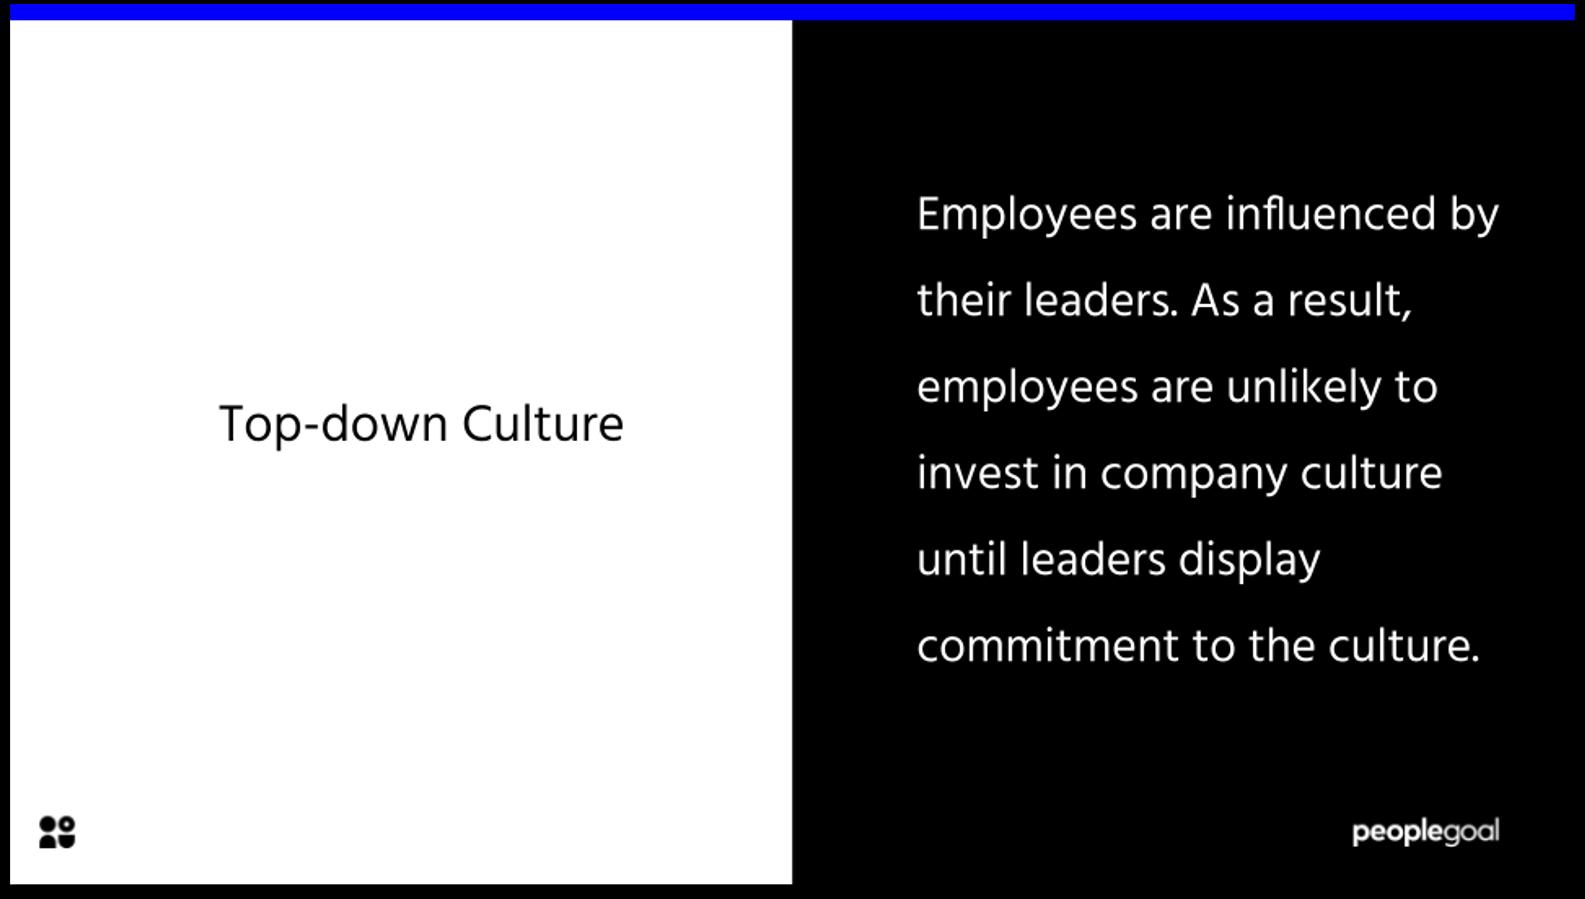 top-down culture